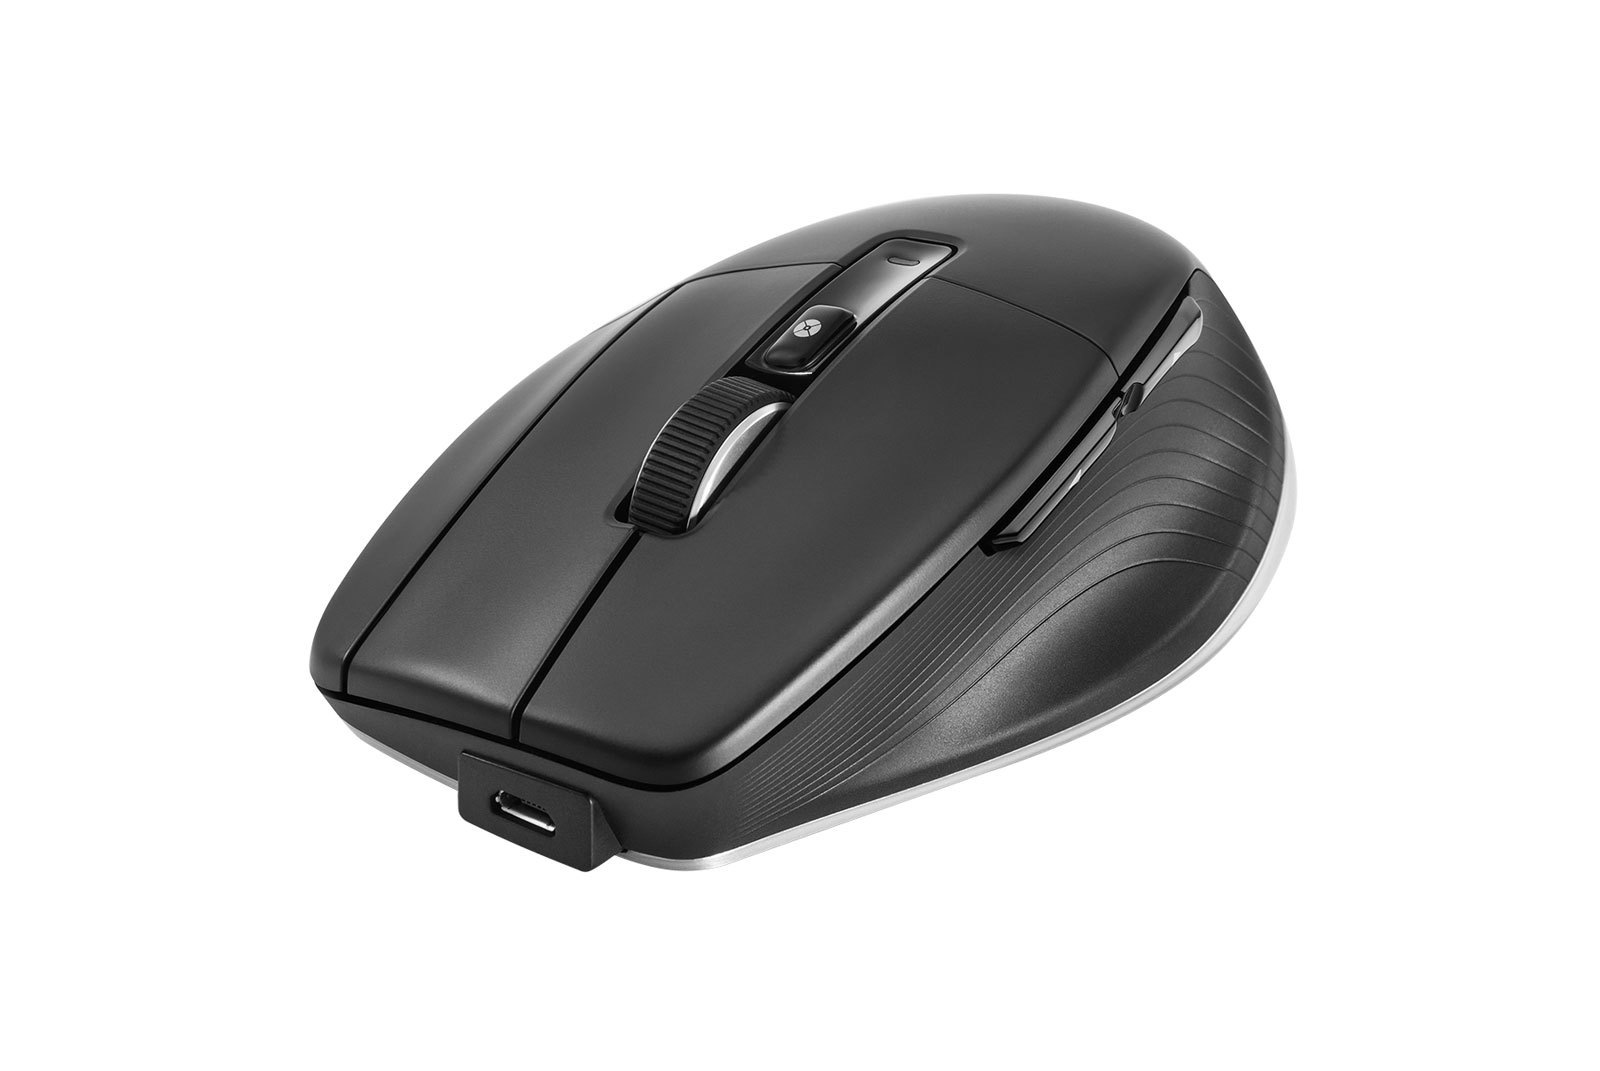 CadMouse Pro Wireless, 3Dconnexion